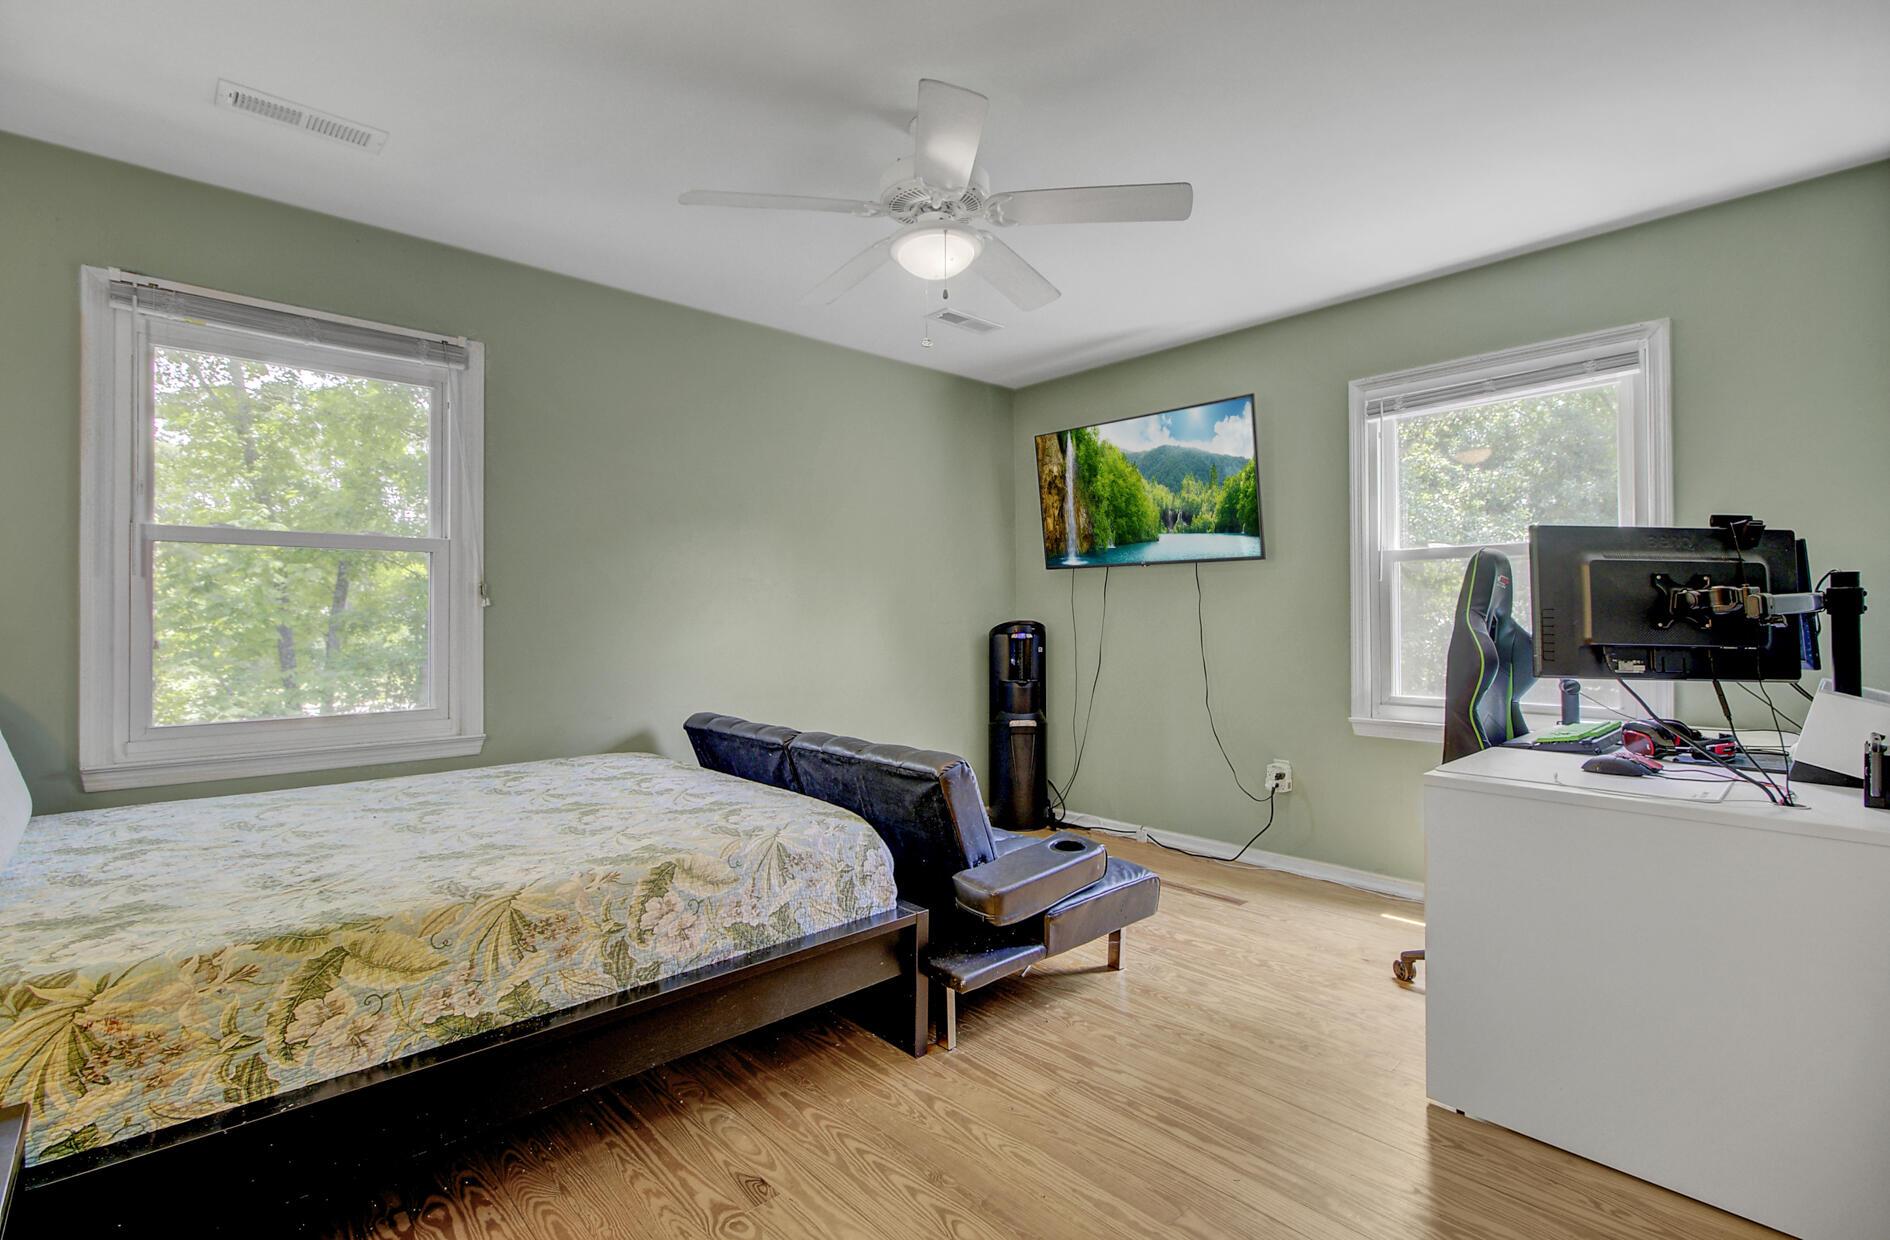 Yaugh Hall Homes For Sale - 1229 Porchers Bluff, Mount Pleasant, SC - 4